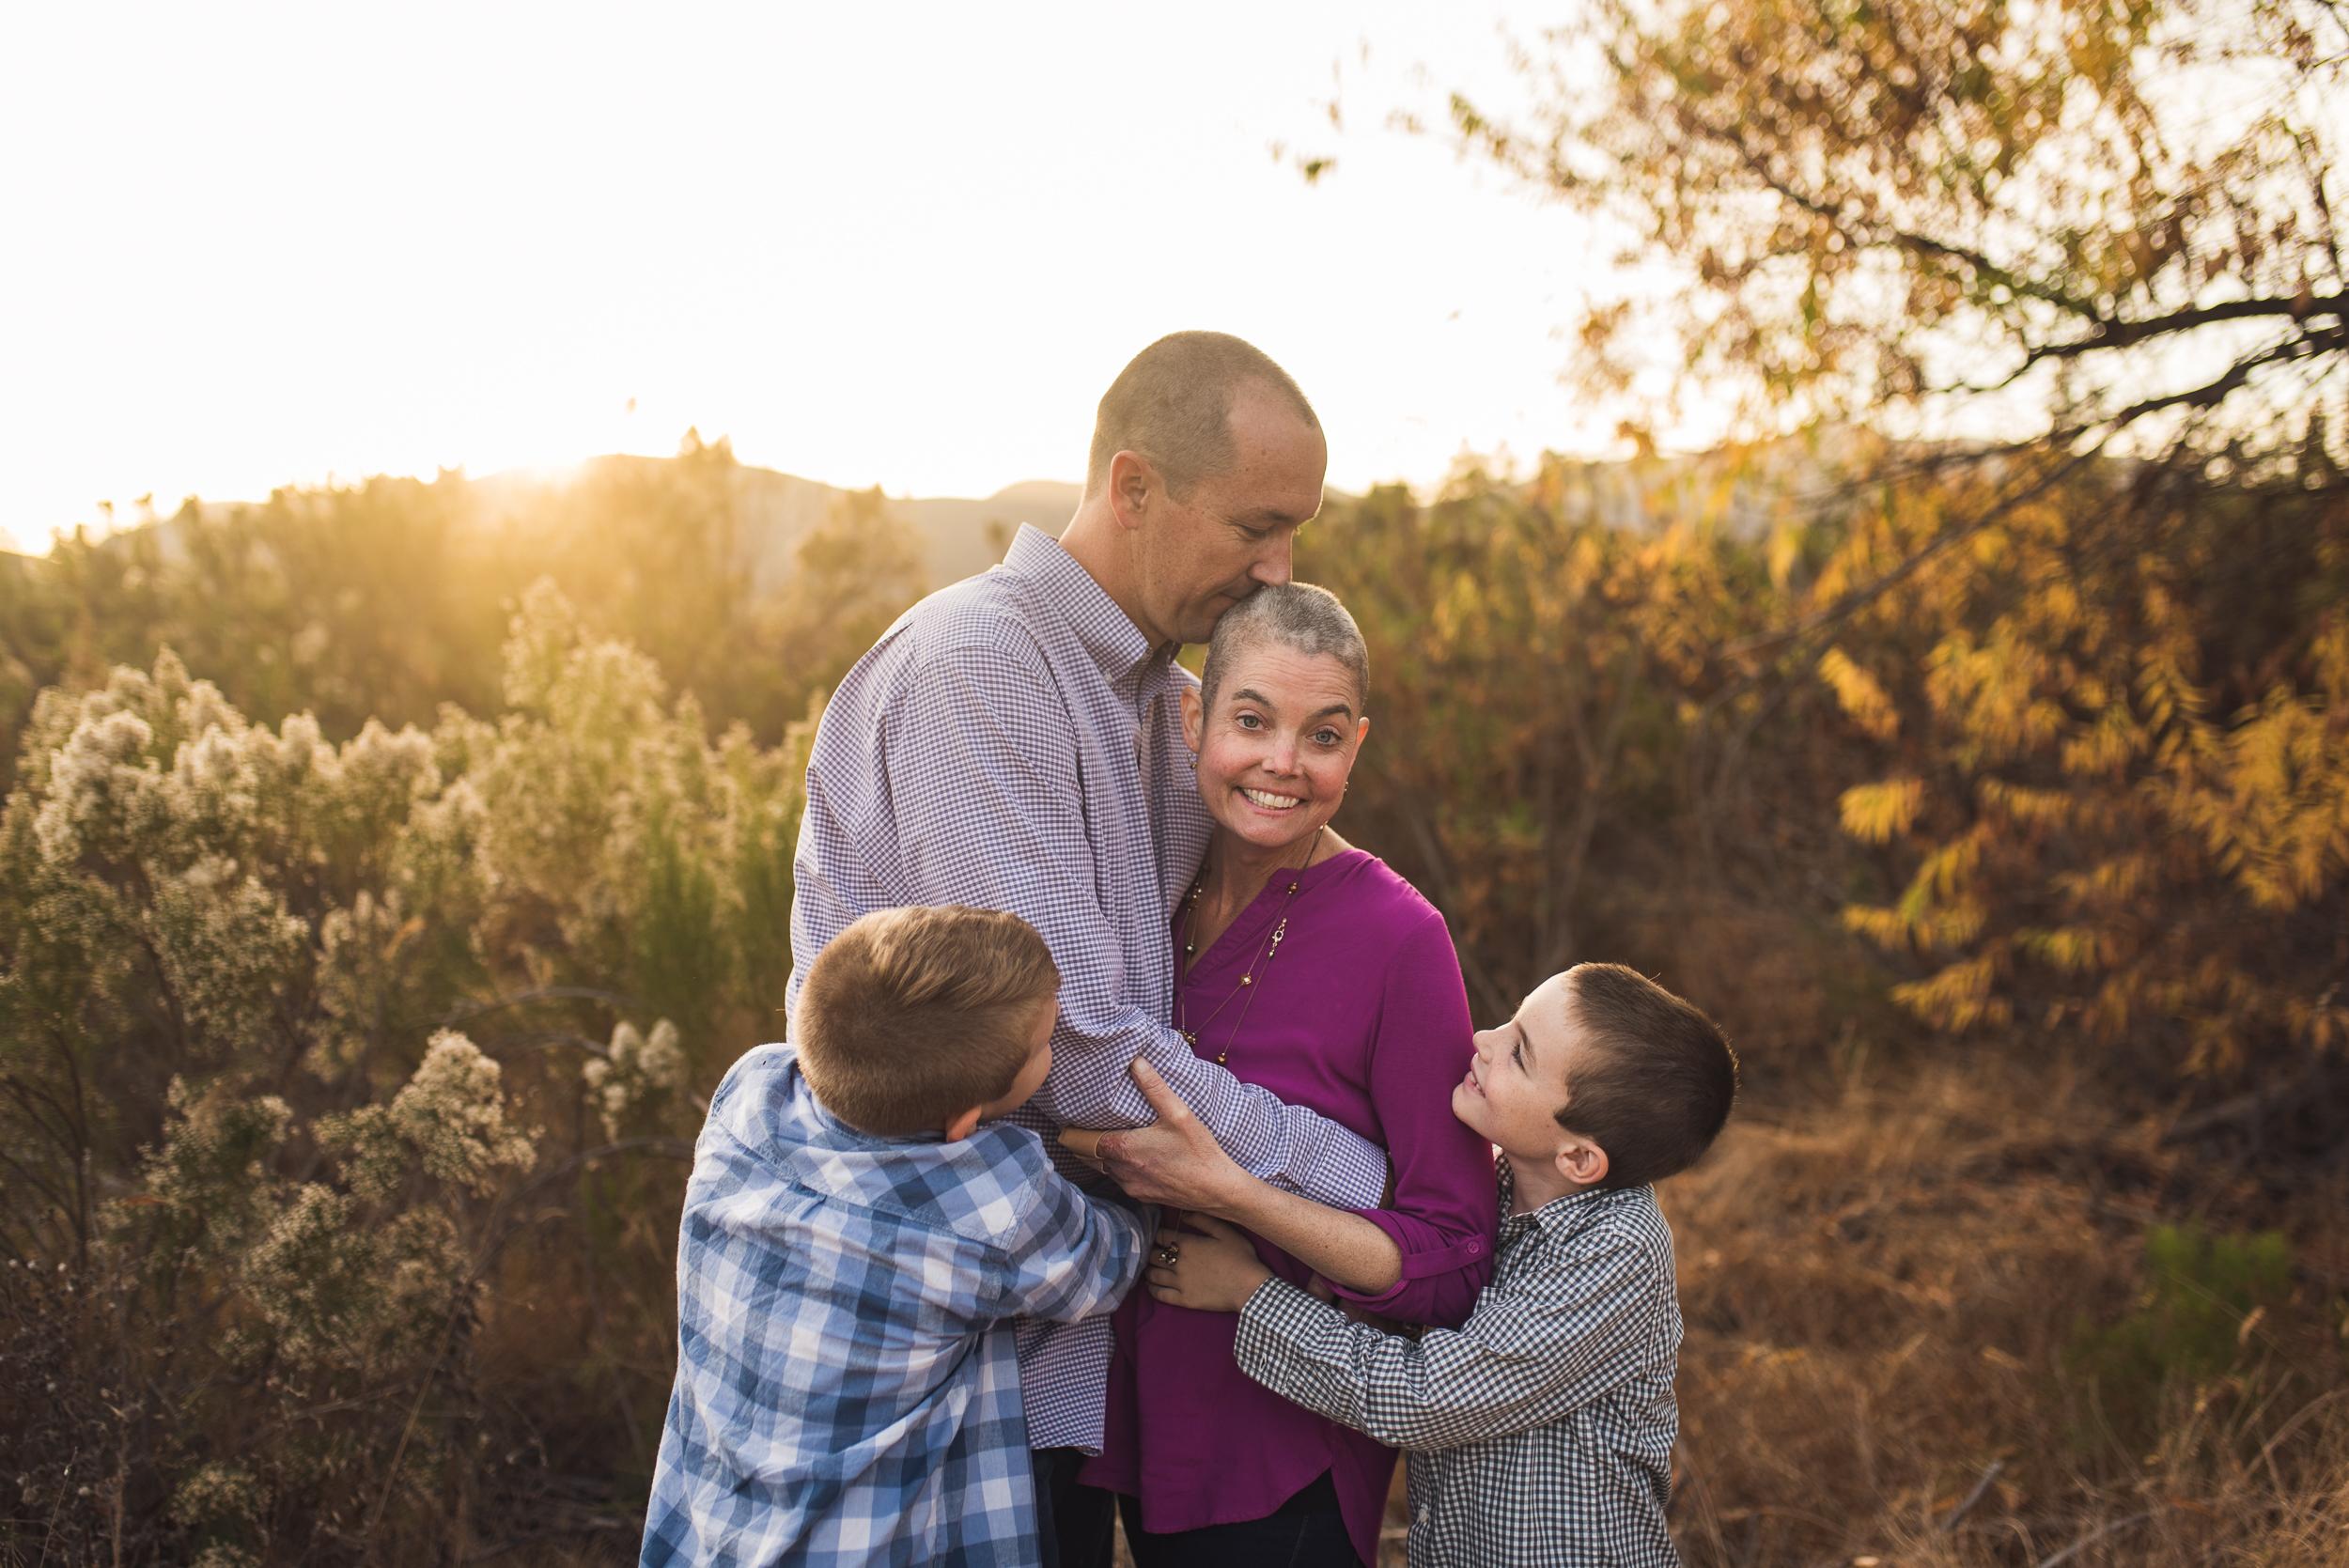 2018-San-Diego-Family-Lifestyle-Newborn-Travel-Vacation-Photographer-Kelsey-Smith-Photography-Coronado-La-Jolla-Encinitas-Solana-Beach-Del-Mar-55.jpg